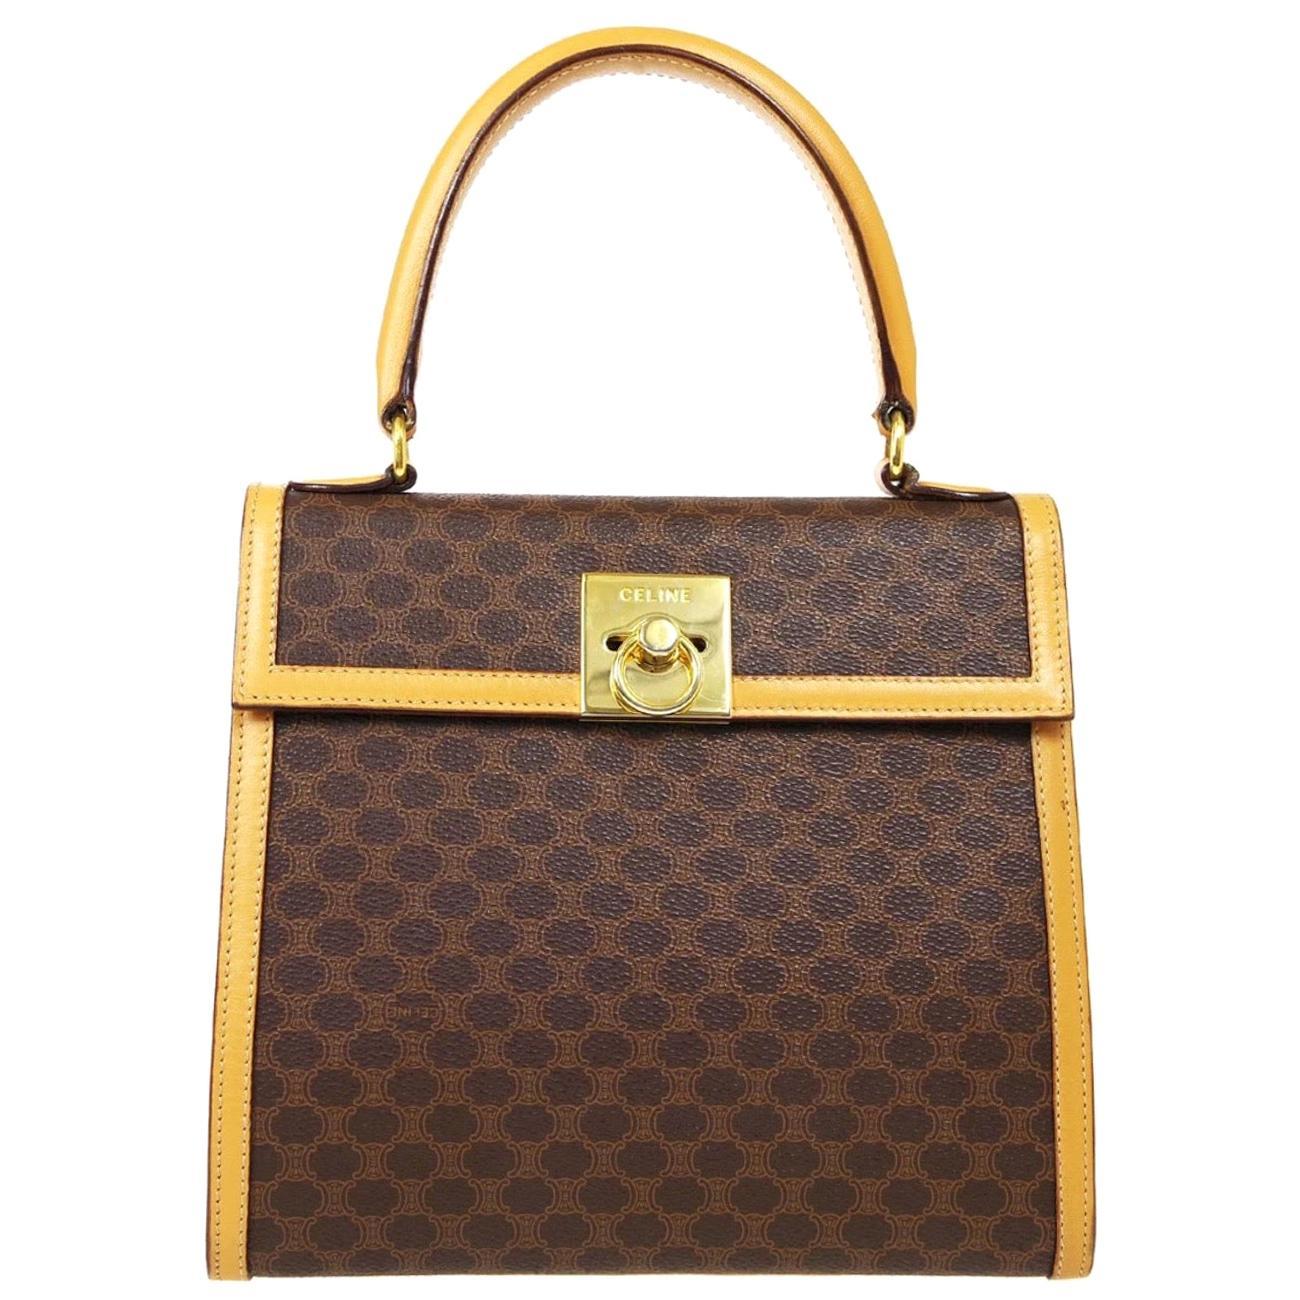 Celine Monogram Cognac Gold Kelly Style Top Handle Satchel Flap Shoulder Bag